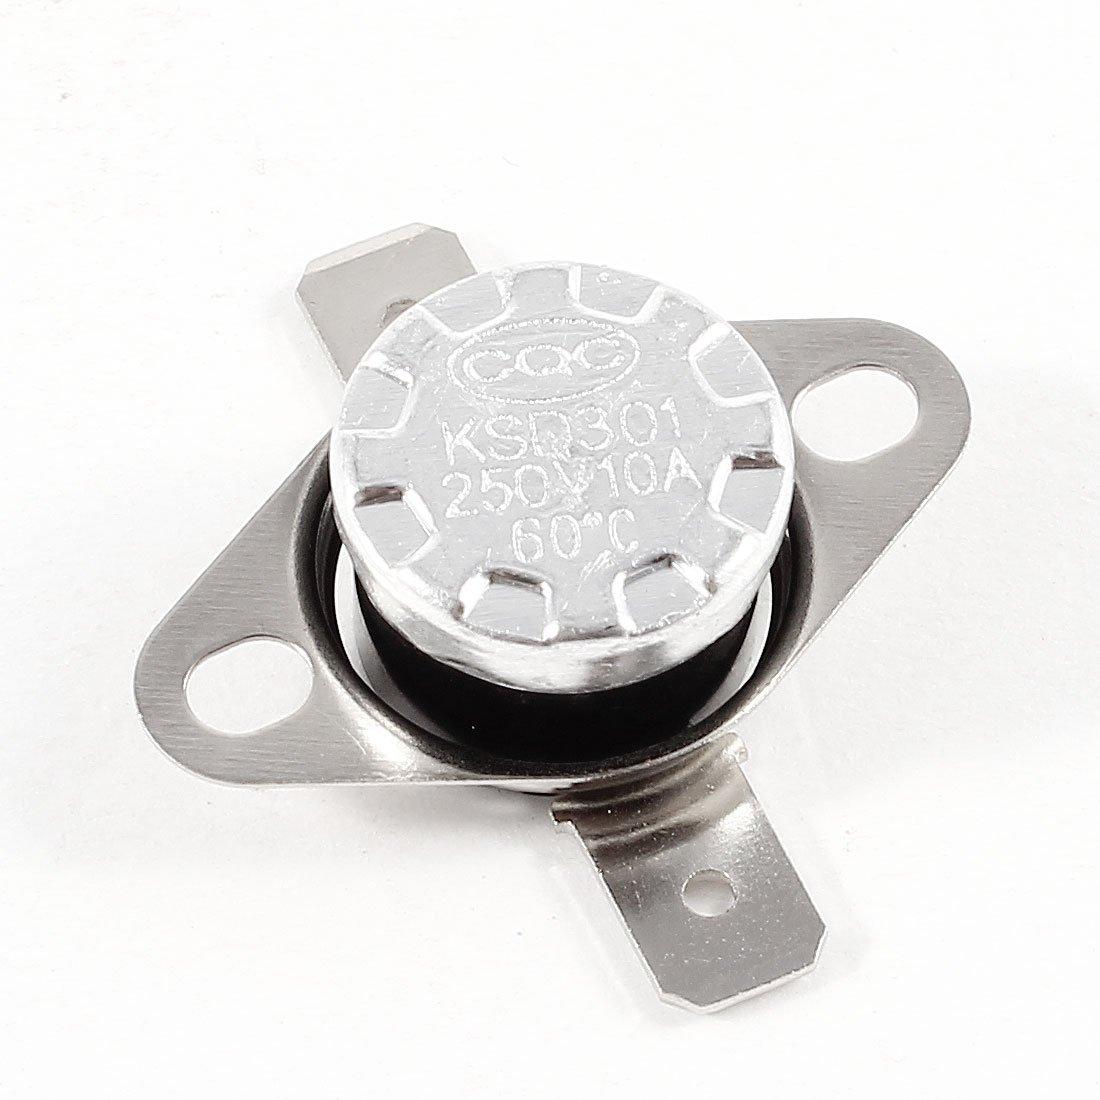 KSD301 AC 250V 10A 60Celsius NC Temperature Control Switch Thermostat Sourcingmap a13120500ux0278